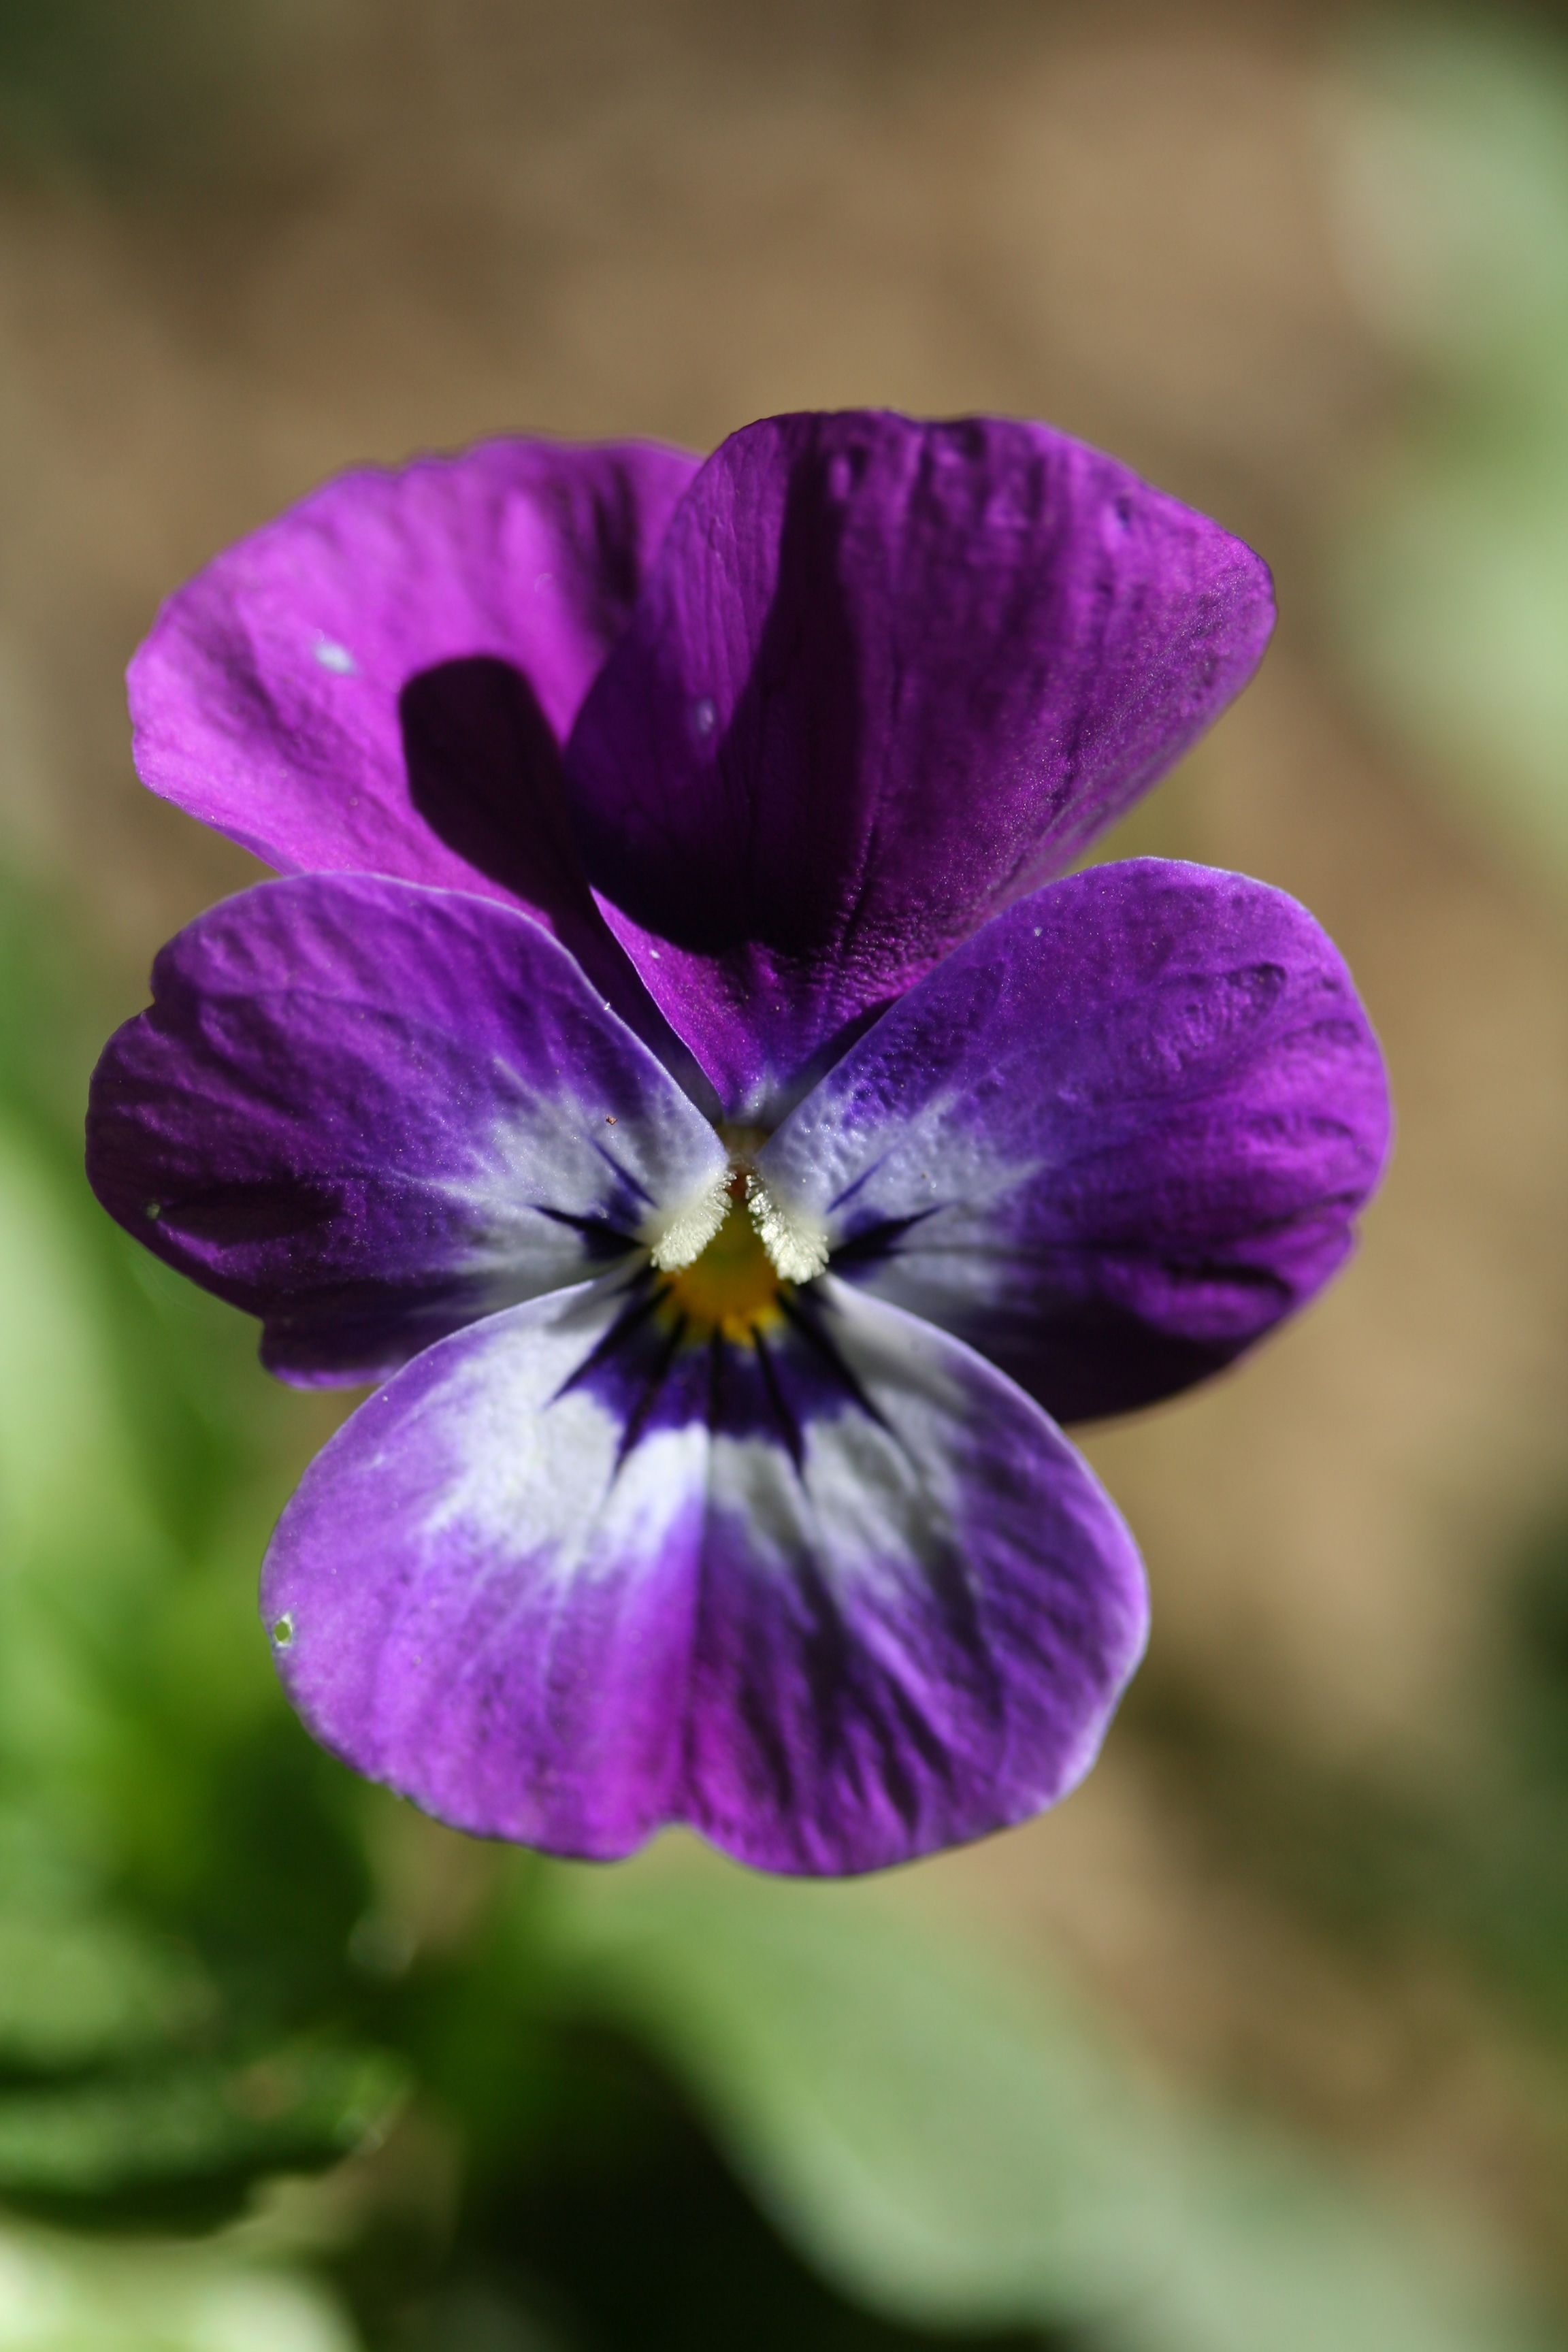 Description Pansy Purple Flower Jpg Pansies Flowers Types Of Purple Flowers Purple Flowers